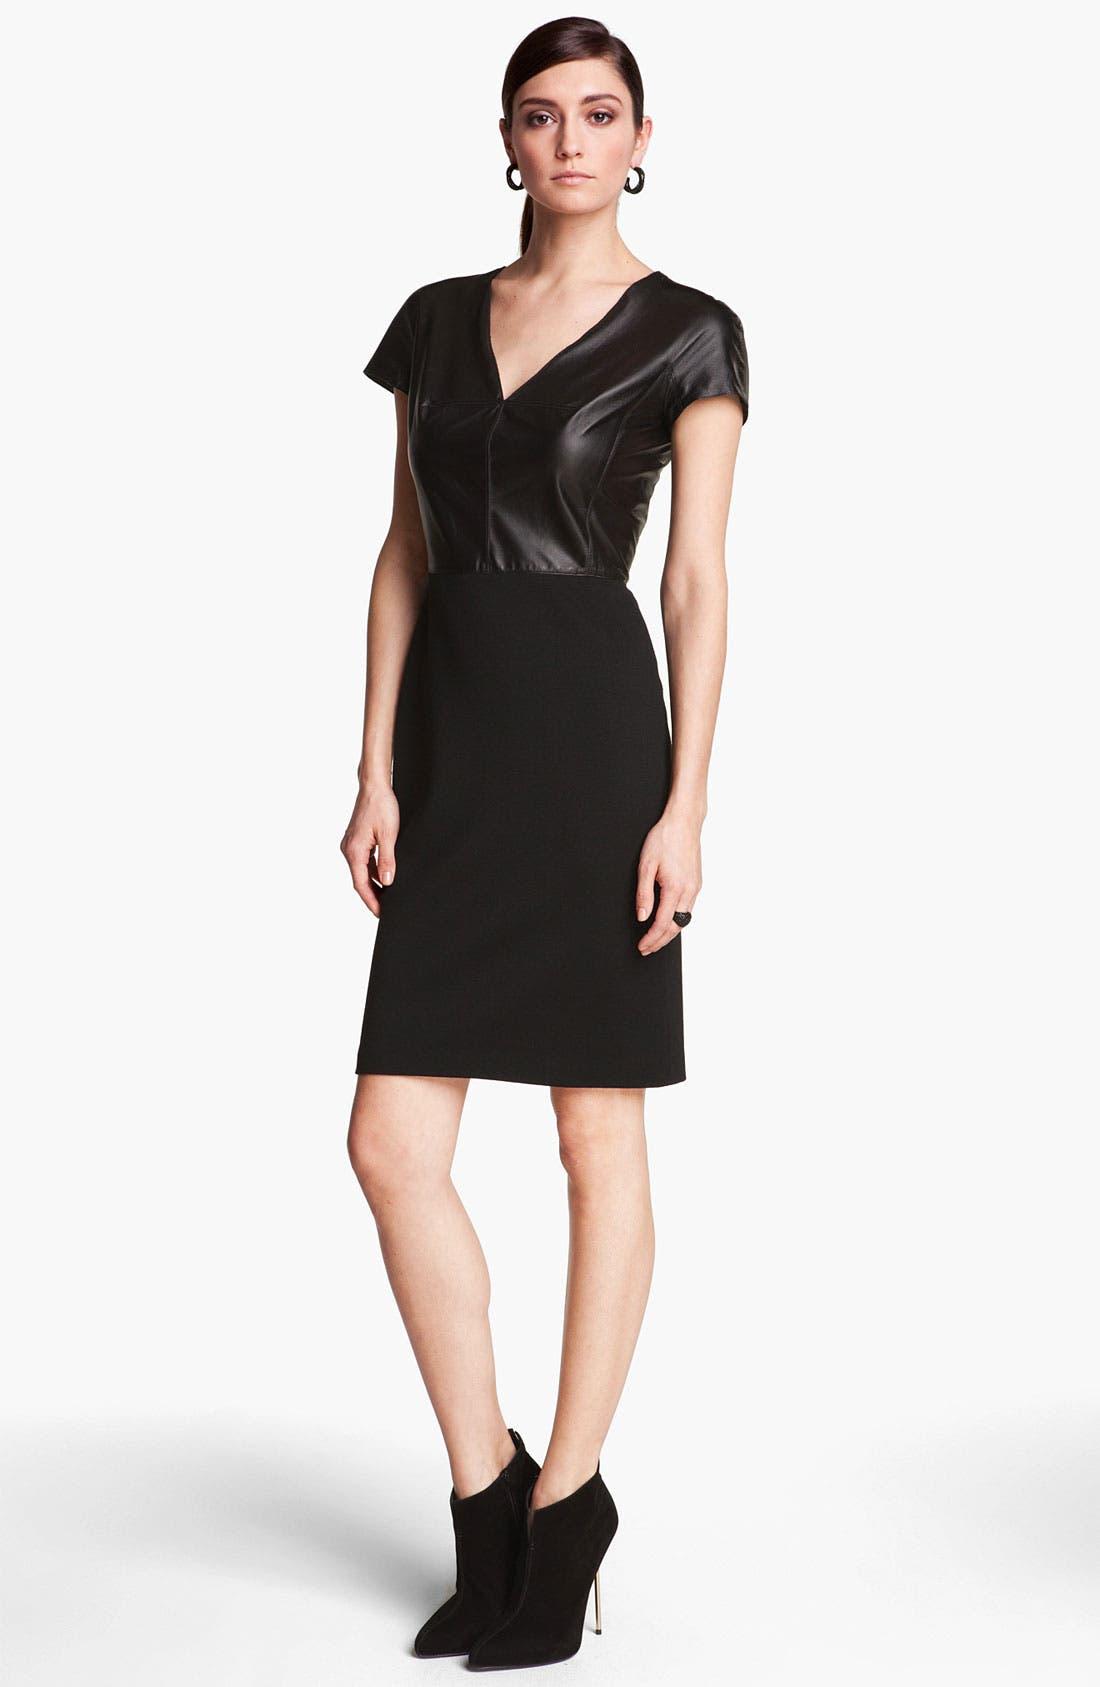 Main Image - St. John Collection Nappa Leather & Milano Knit Dress